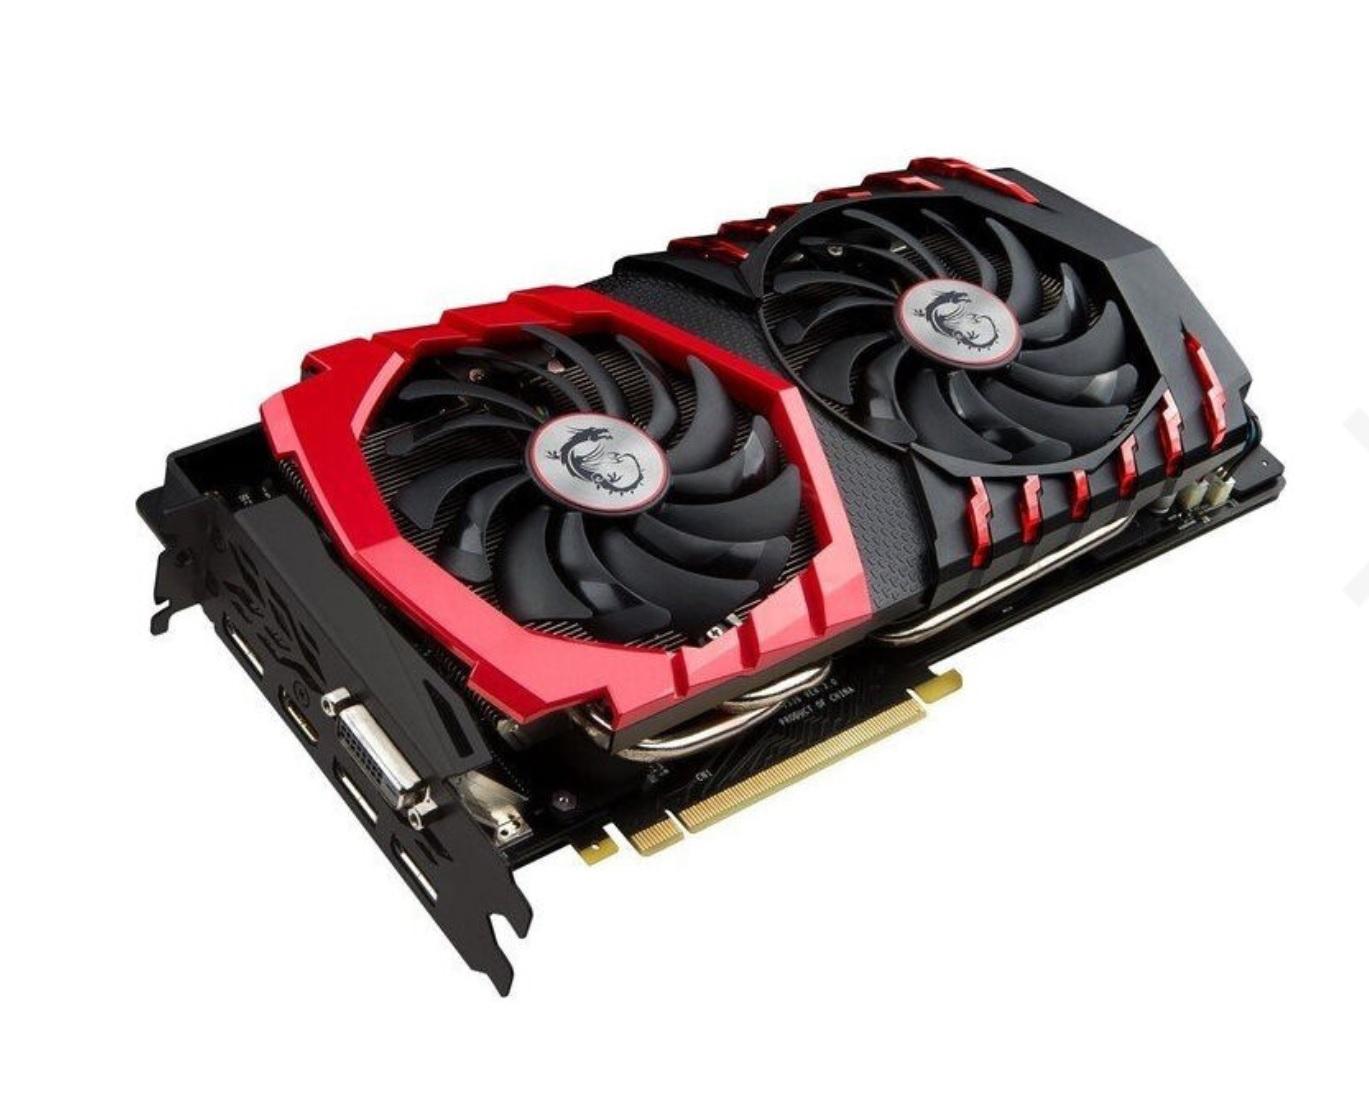 MSI GeForce GTX 1070 Gaming 8G, 8GB GDDR5, DVI, HDMI, 3x DisplayPort